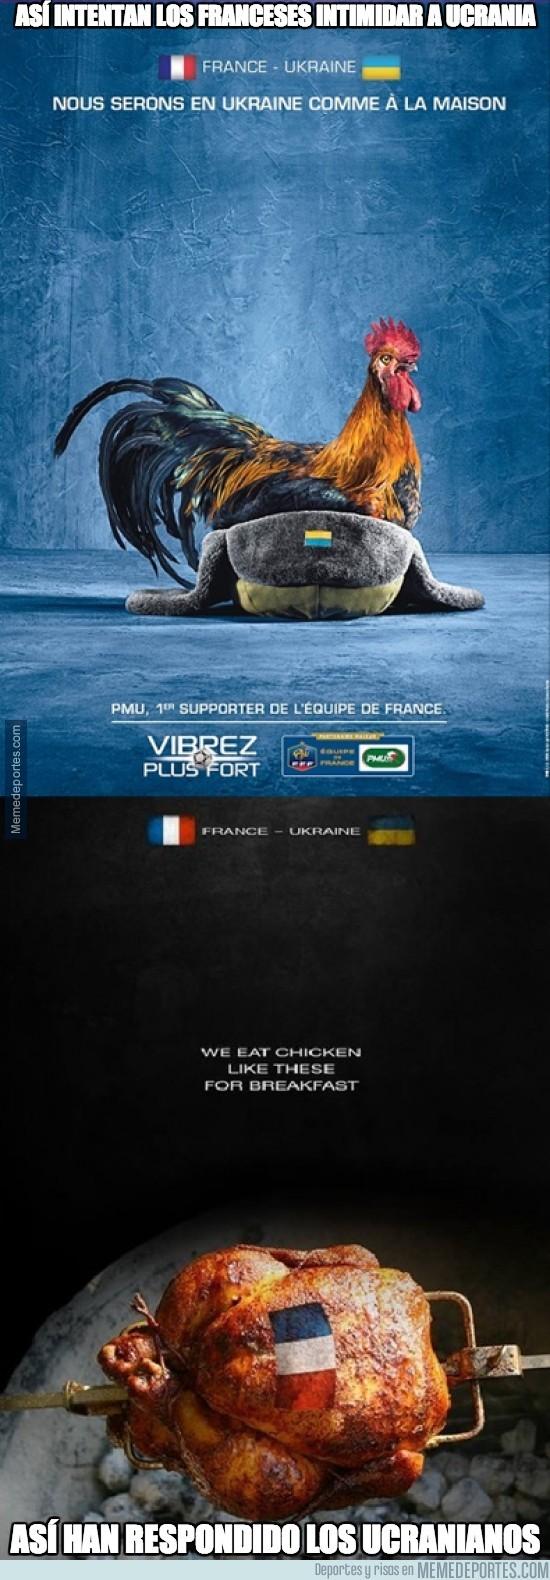 209862 - De esta manera los franceses trataron de intimidar a Ucrania